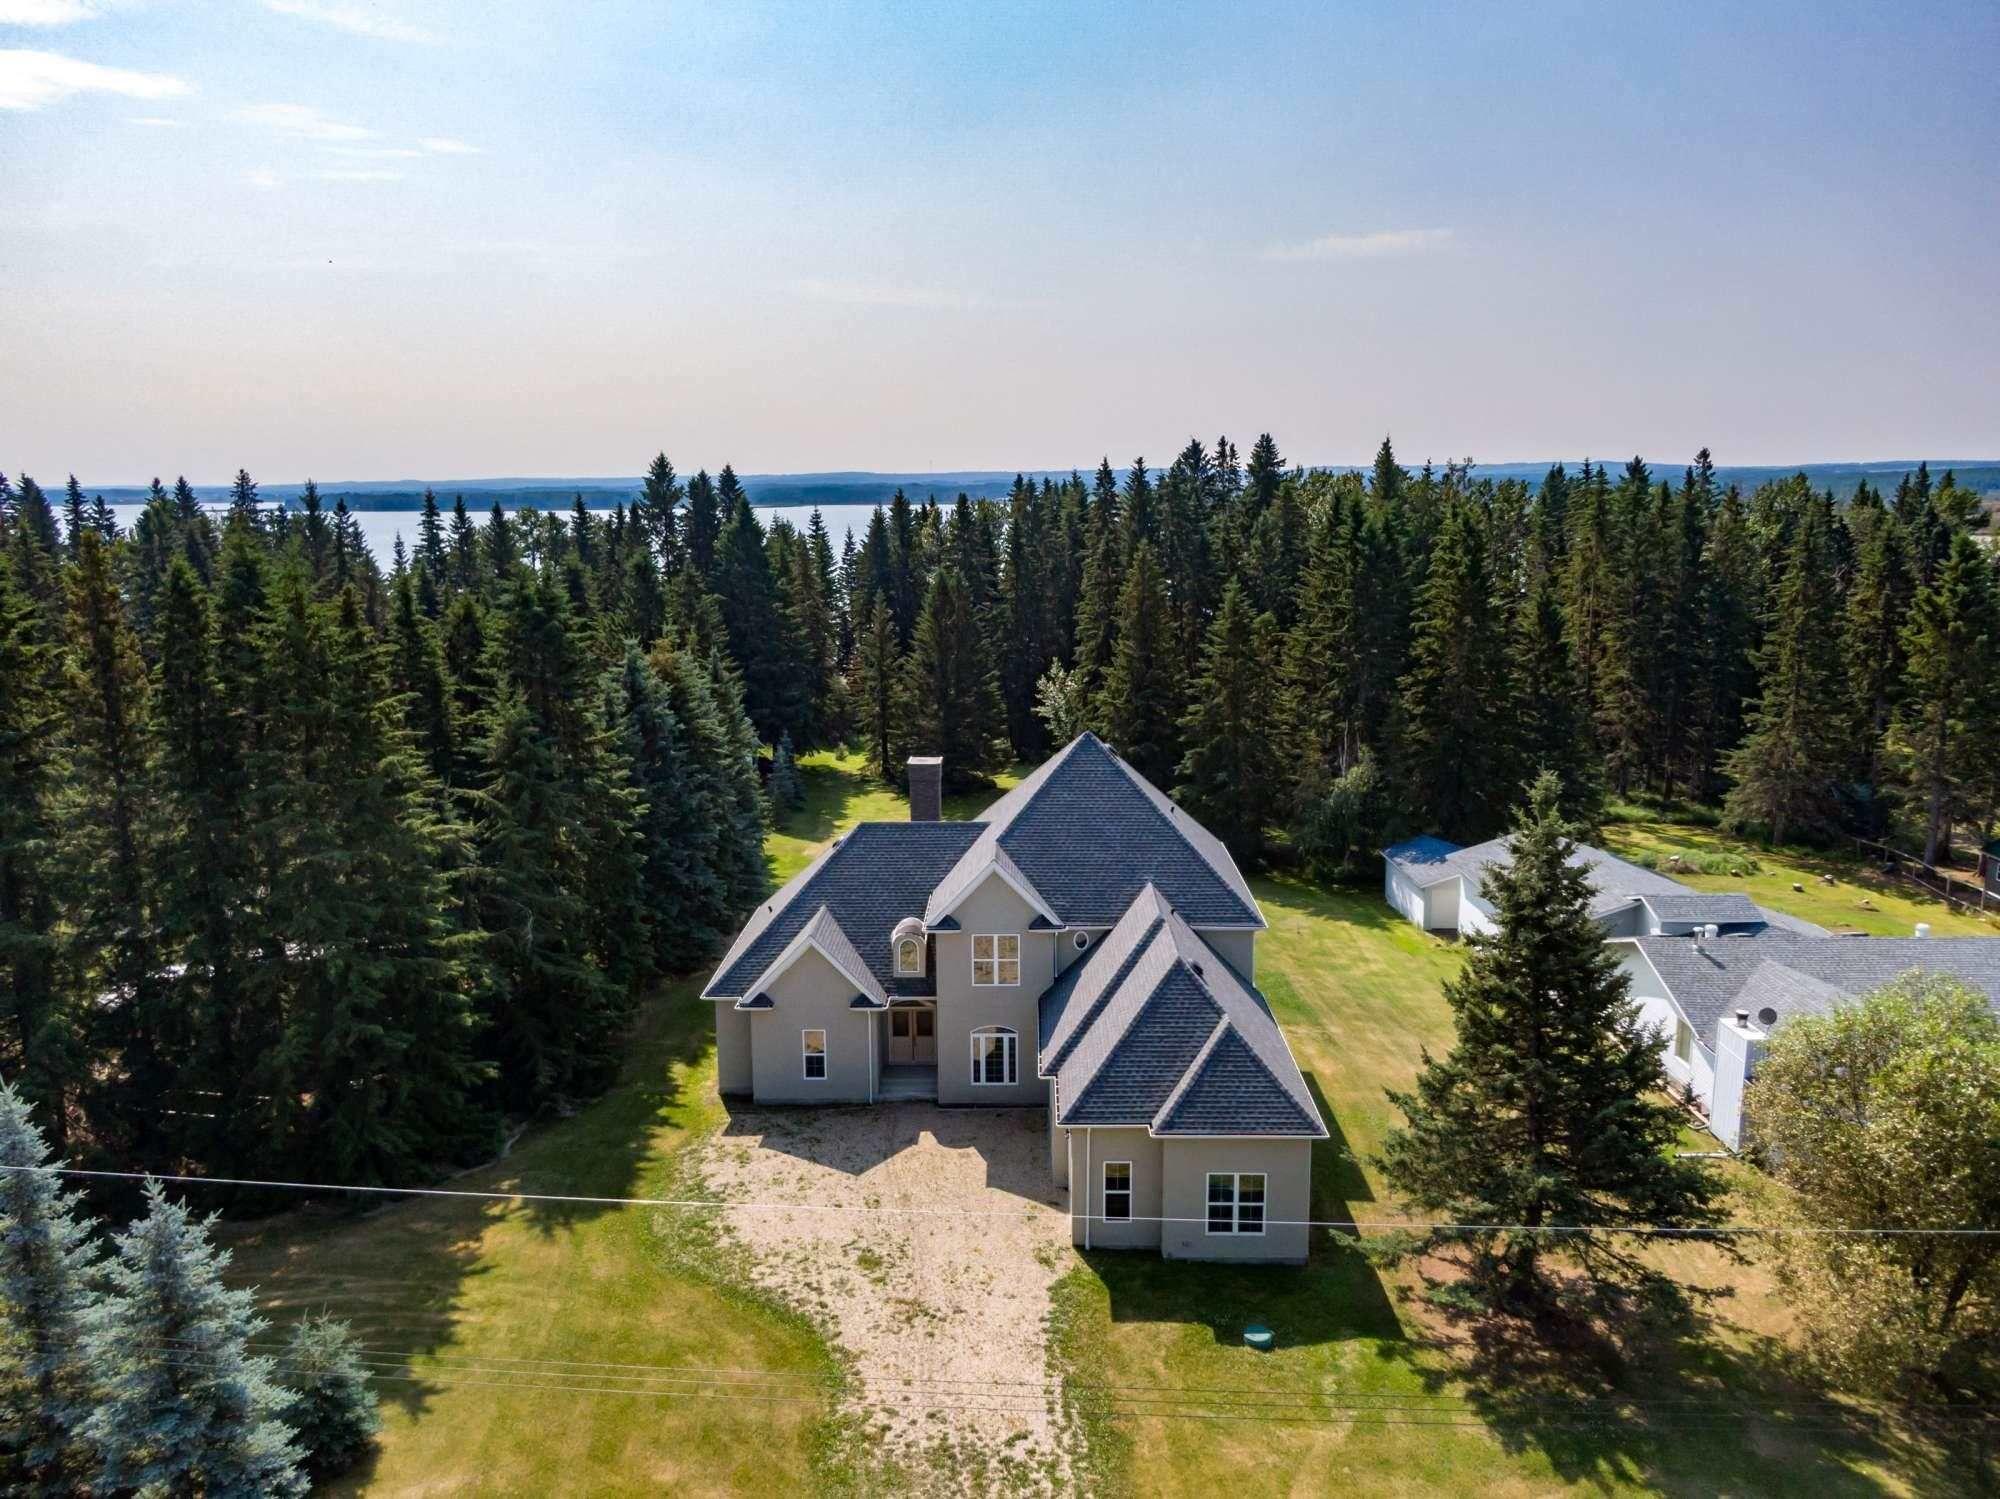 Main Photo: 121 62036 Twp 462: Rural Wetaskiwin County House for sale : MLS®# E4254421